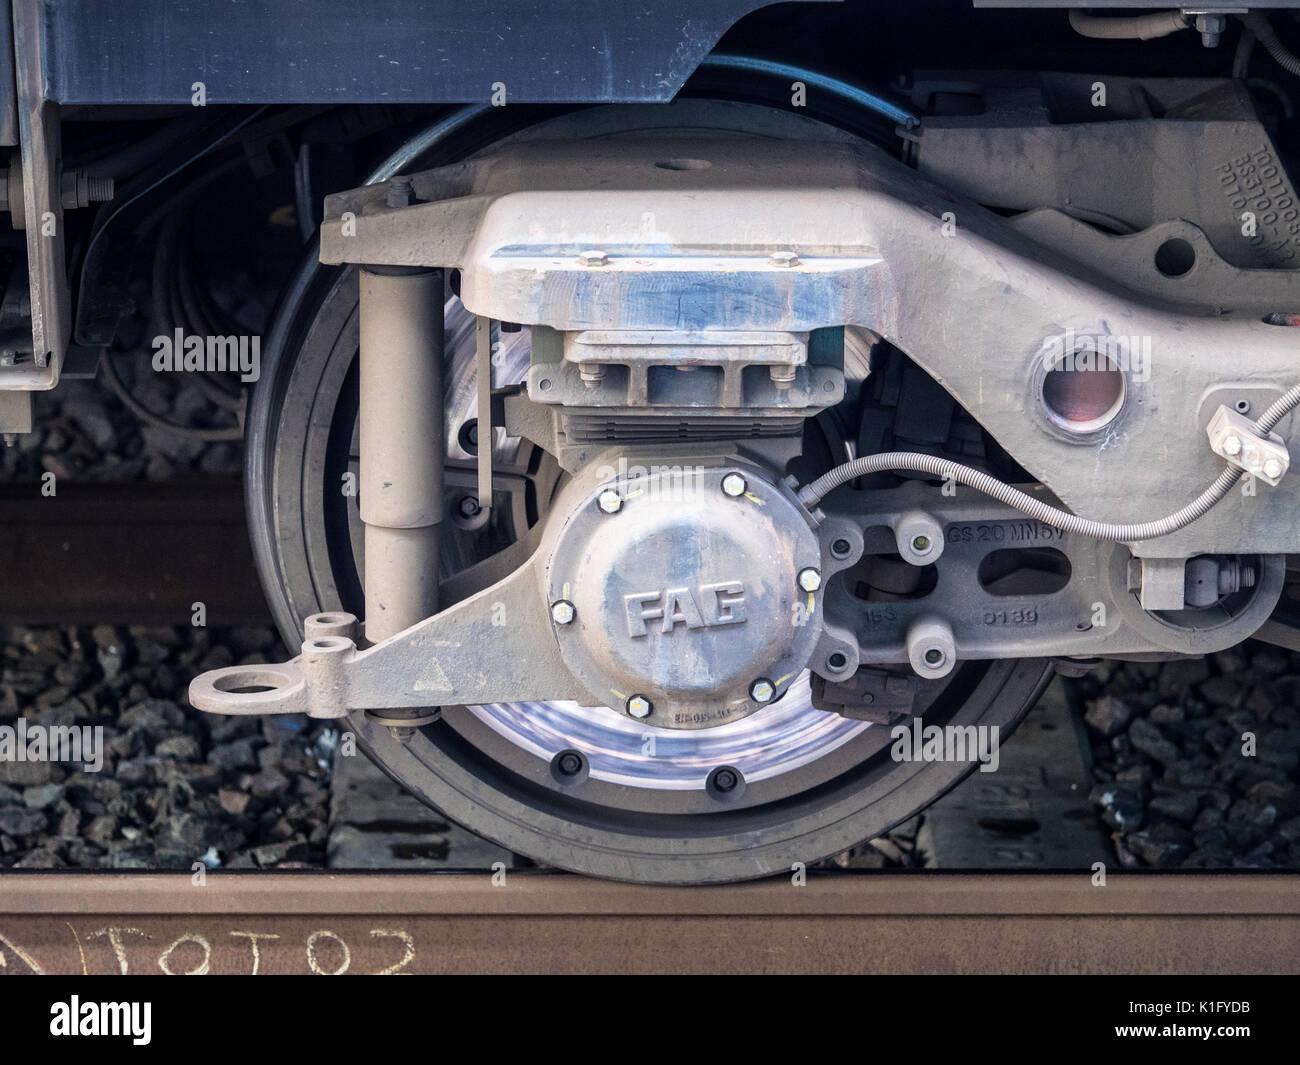 Air brakes stock photos images alamy